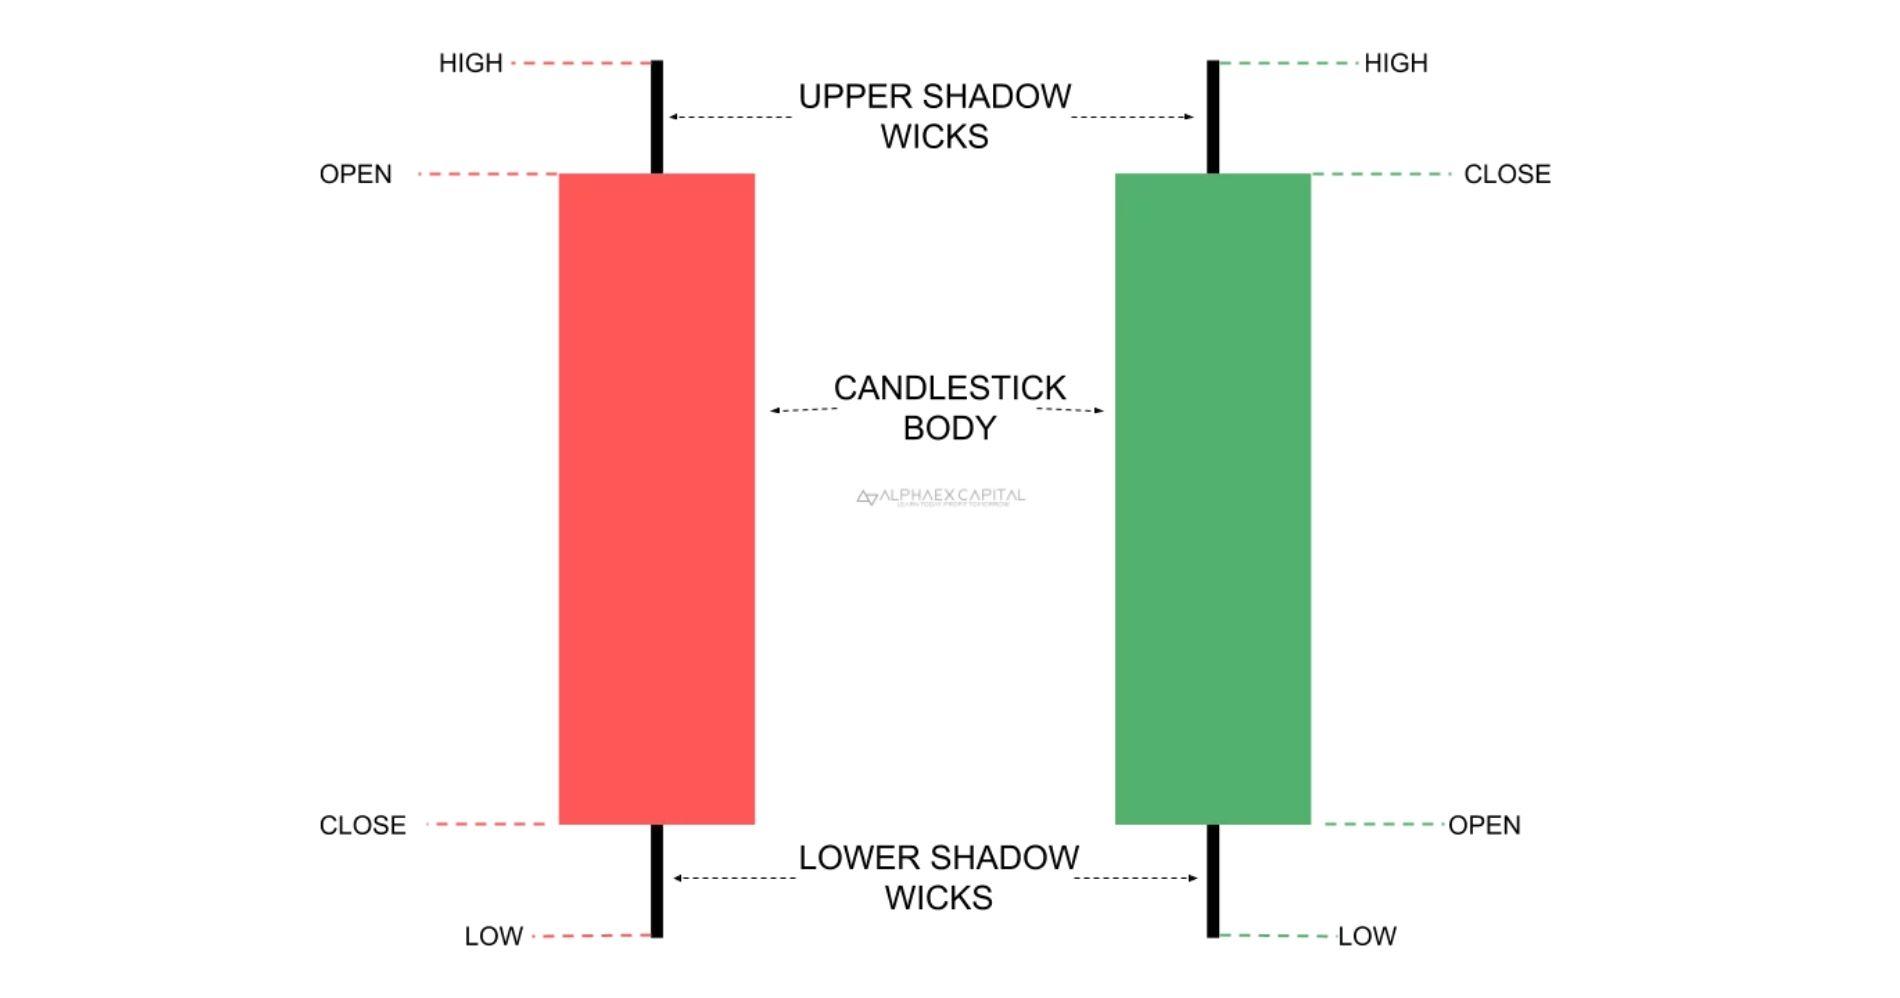 Apa Itu Candlestick Pattern Illustration Web Bisnis Muda - Image: Alpha Ex